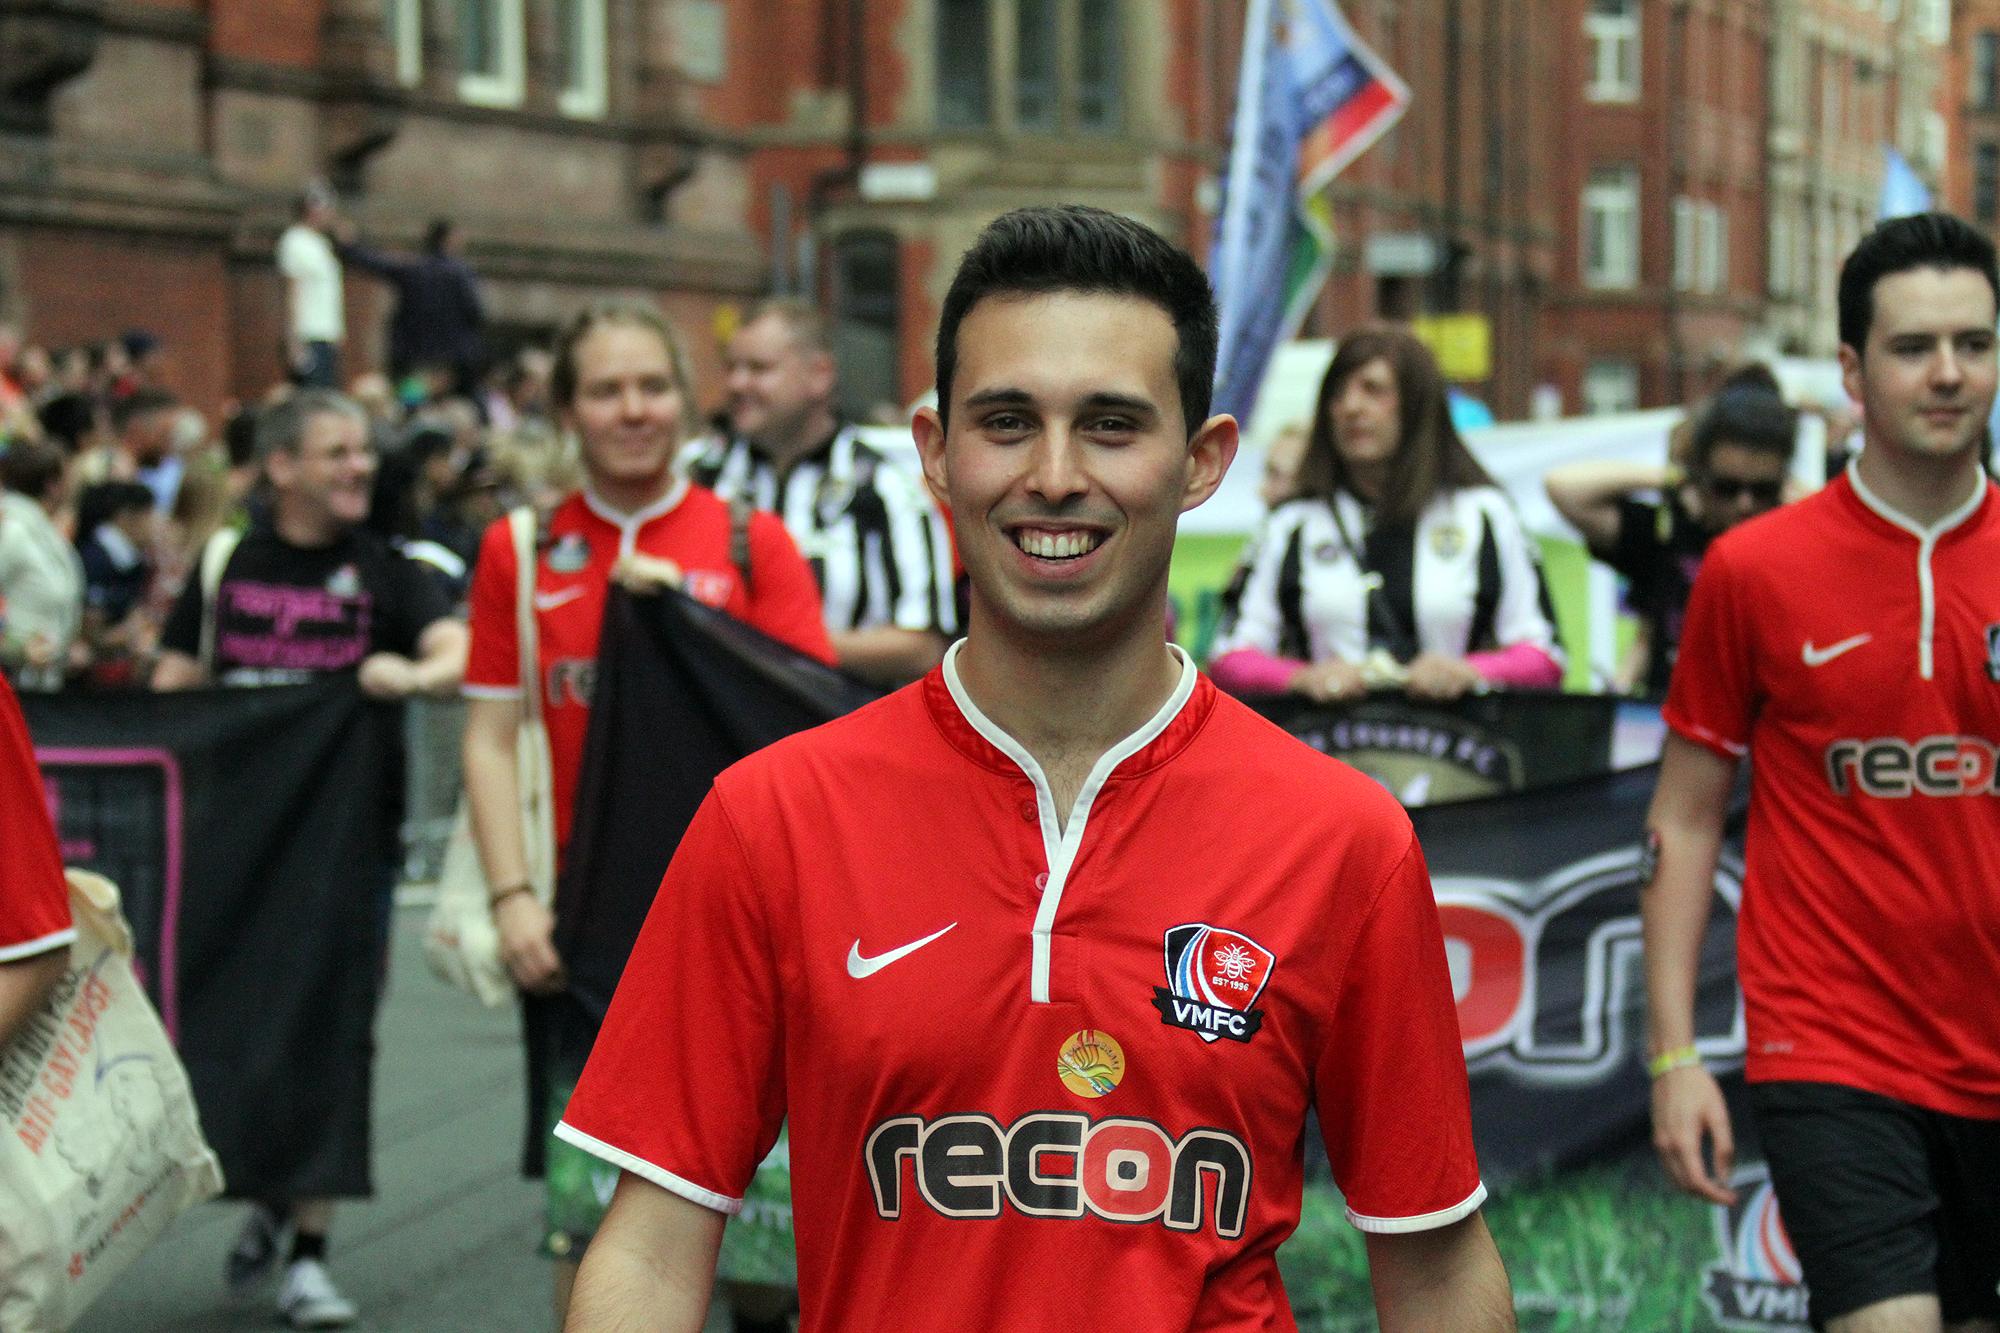 VMFC at Manchester Pride parade 2015  (21).jpg